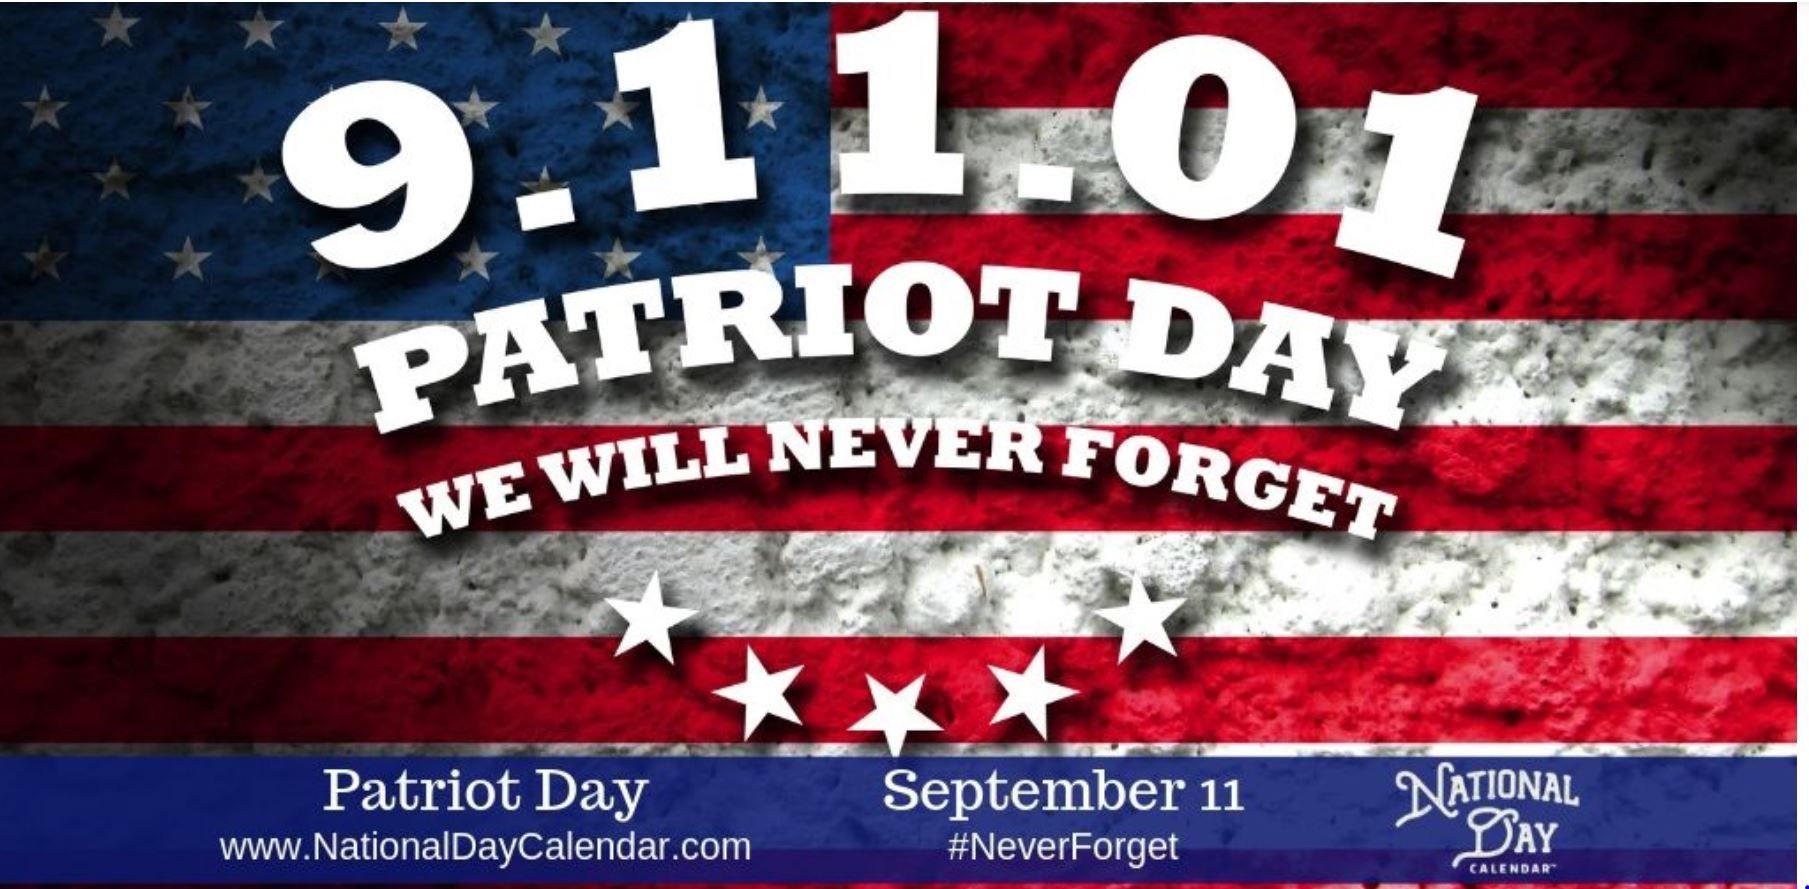 Pin By Linda Gambi On National Holiday Days Patriots Day National Day Calendar National Day